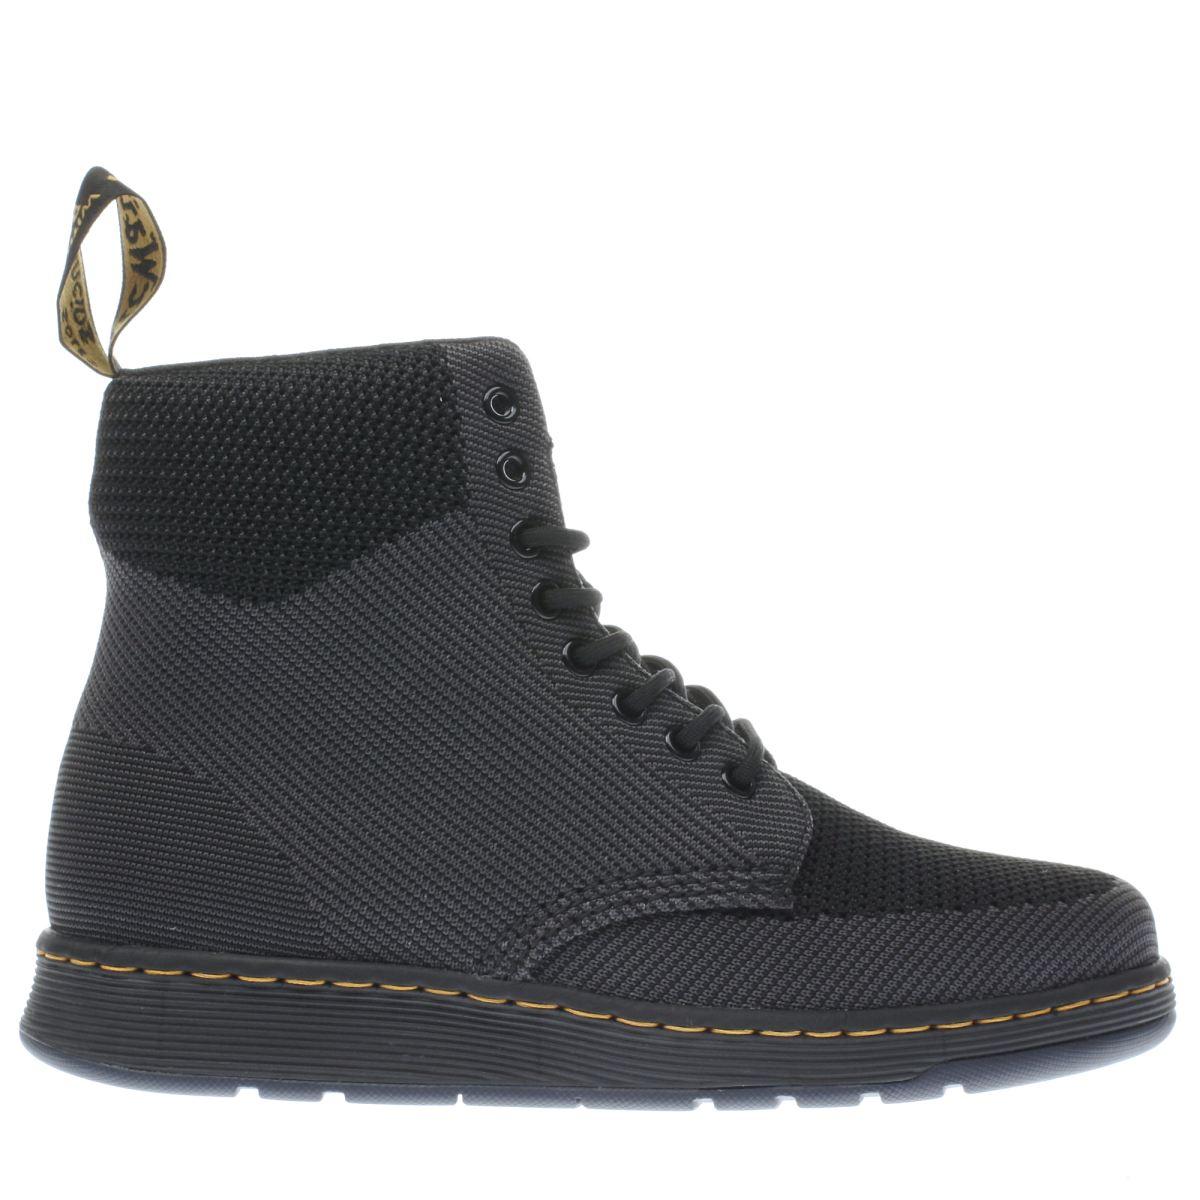 dr martens black rigal boots